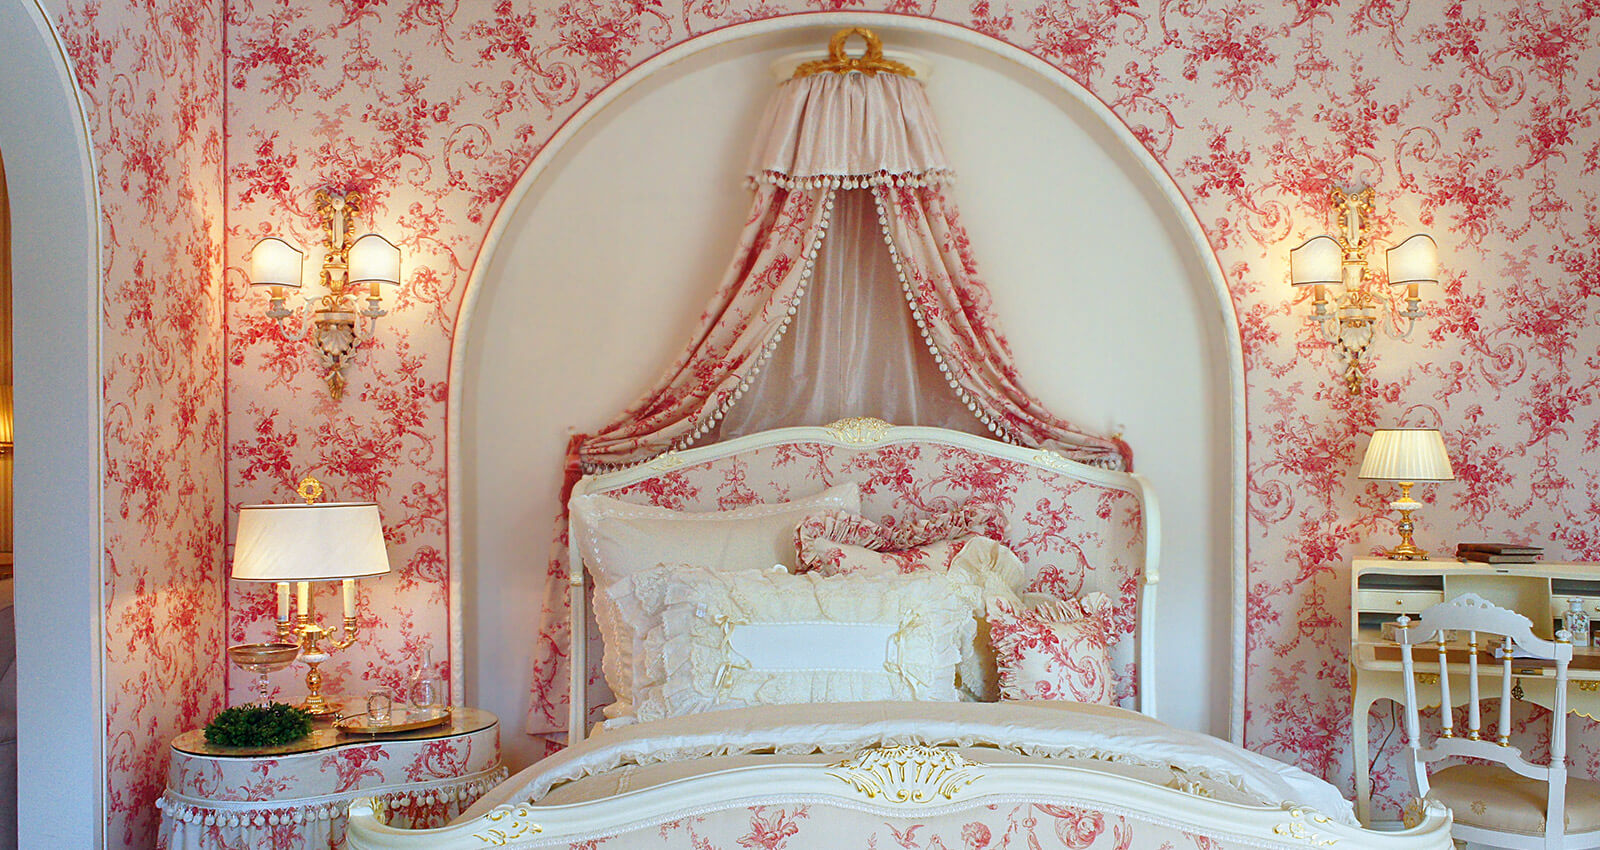 rundgang-13-rosen-schlafzimmer